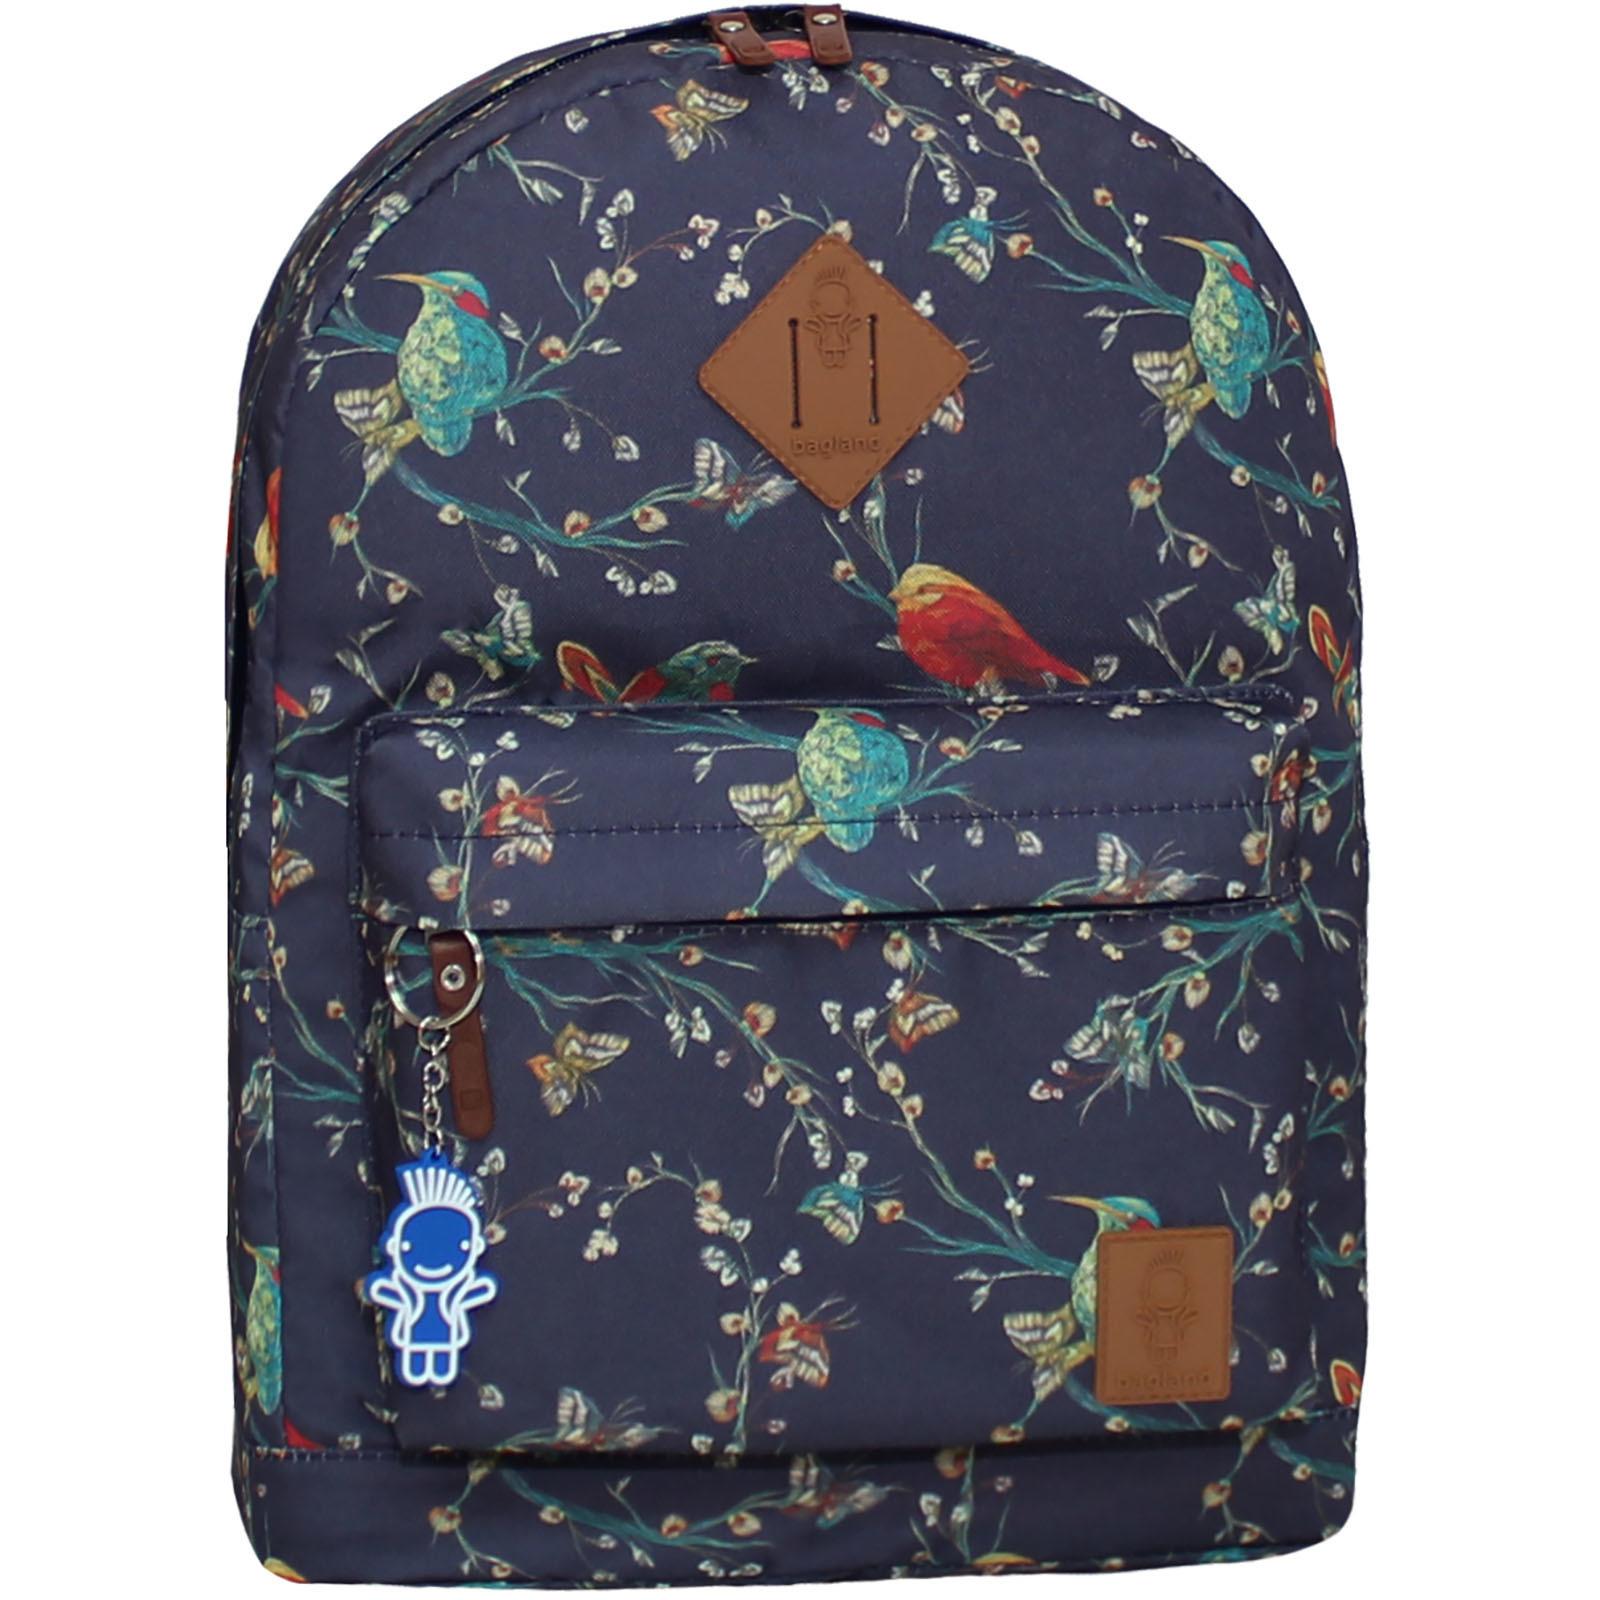 Городские рюкзаки Рюкзак Bagland Молодежный (дизайн) 17 л. сублимация 160 (00533664) Без_имени-1_160.jpg